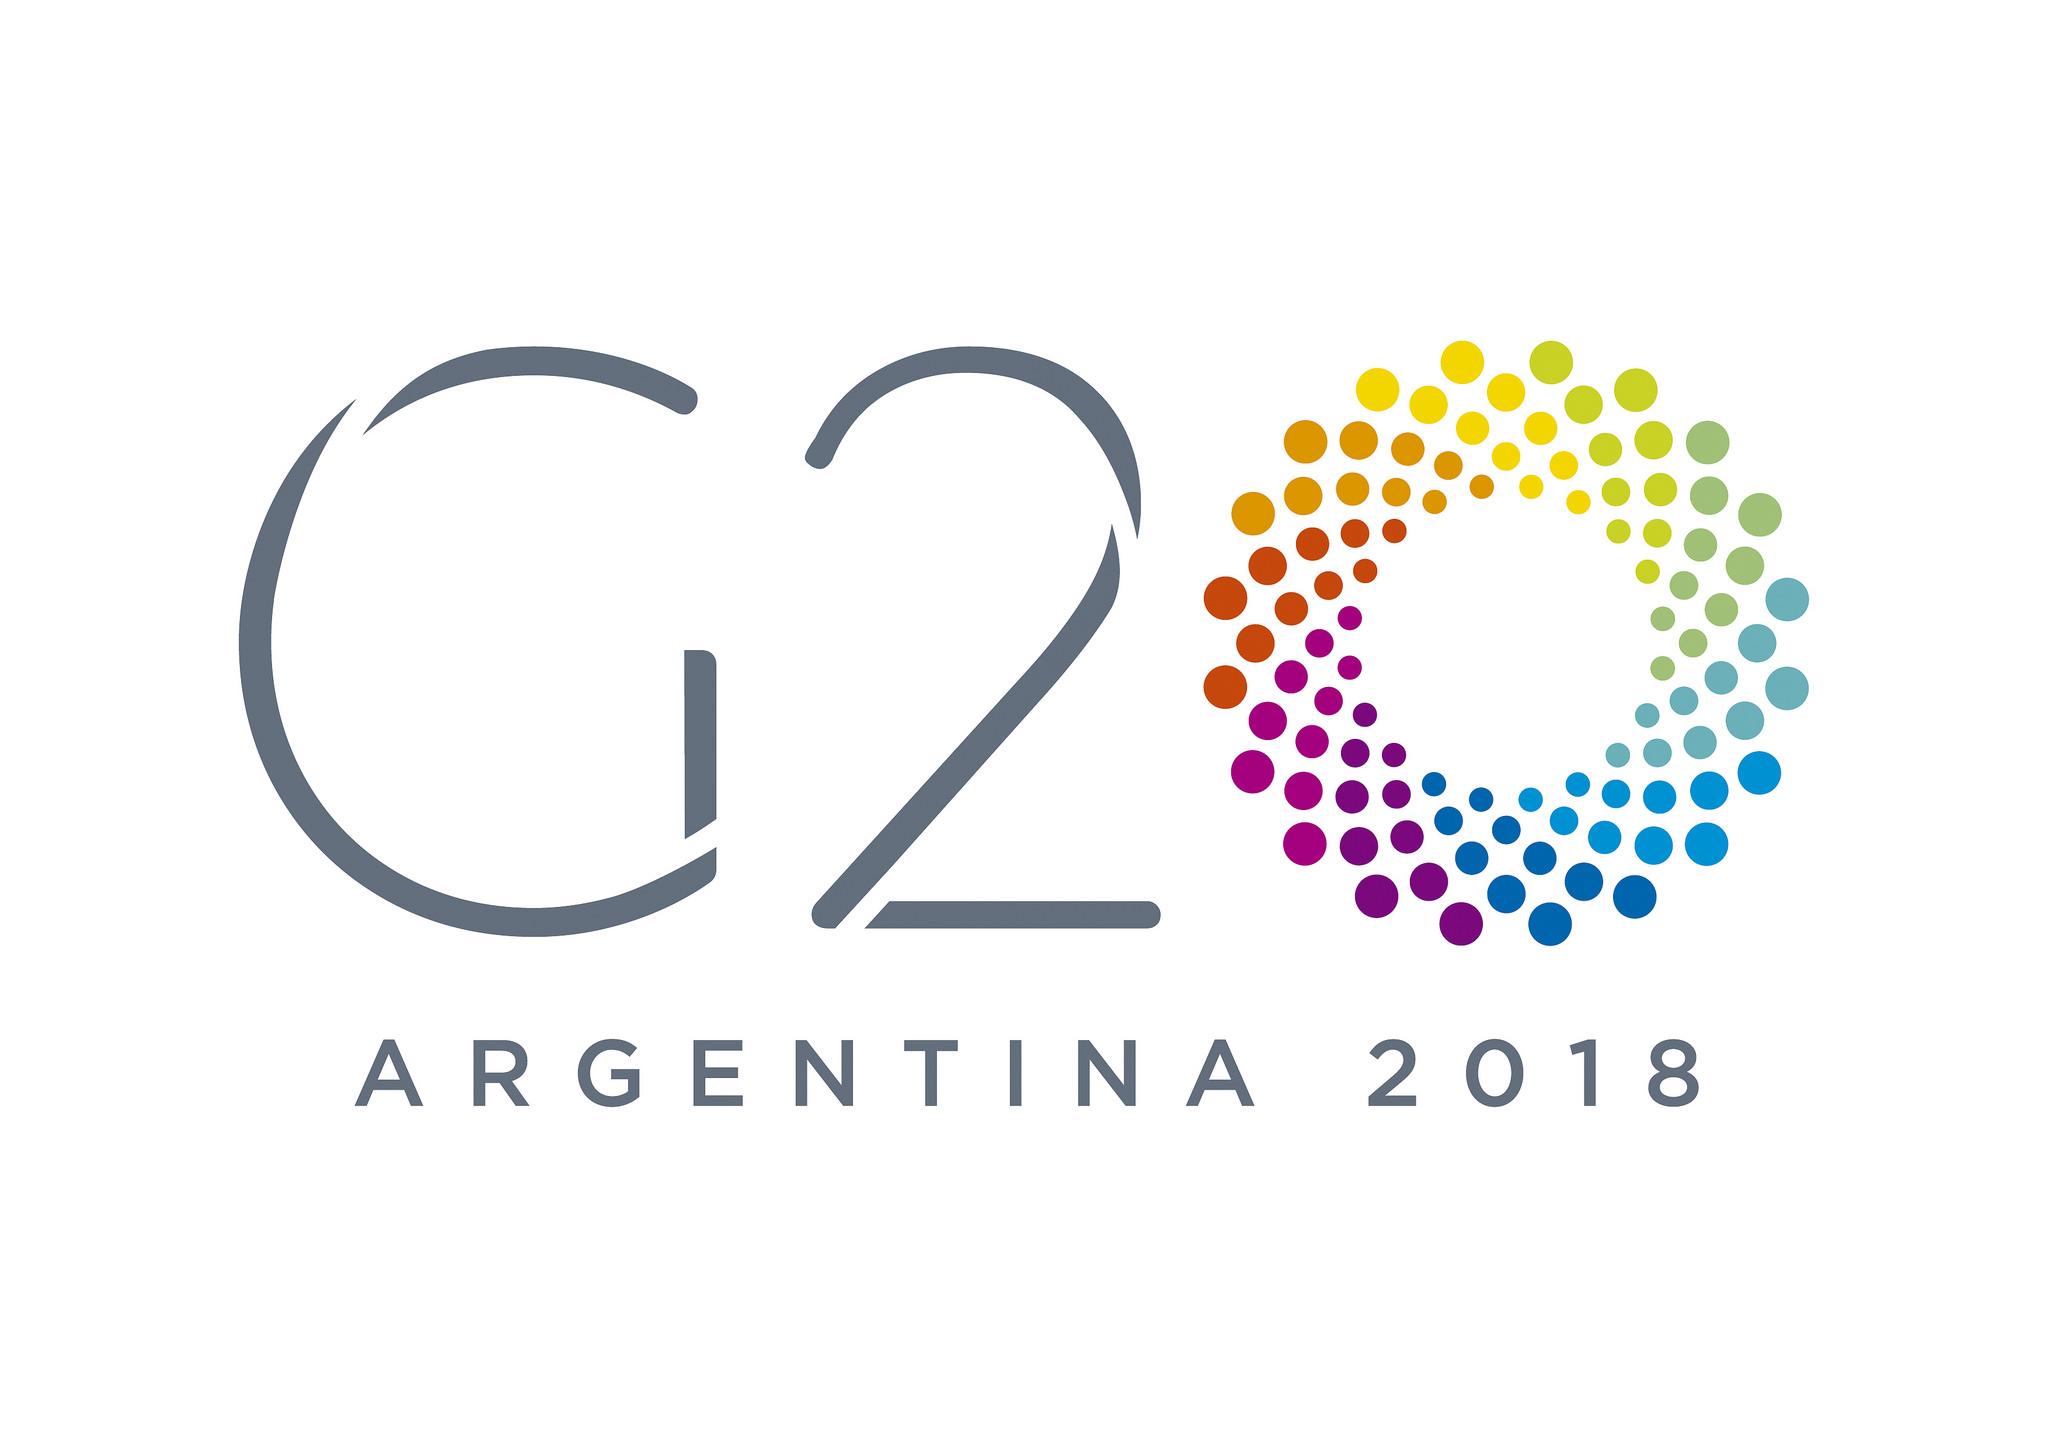 G20 Argentina 2018: Cultural performance at Colon Theatre